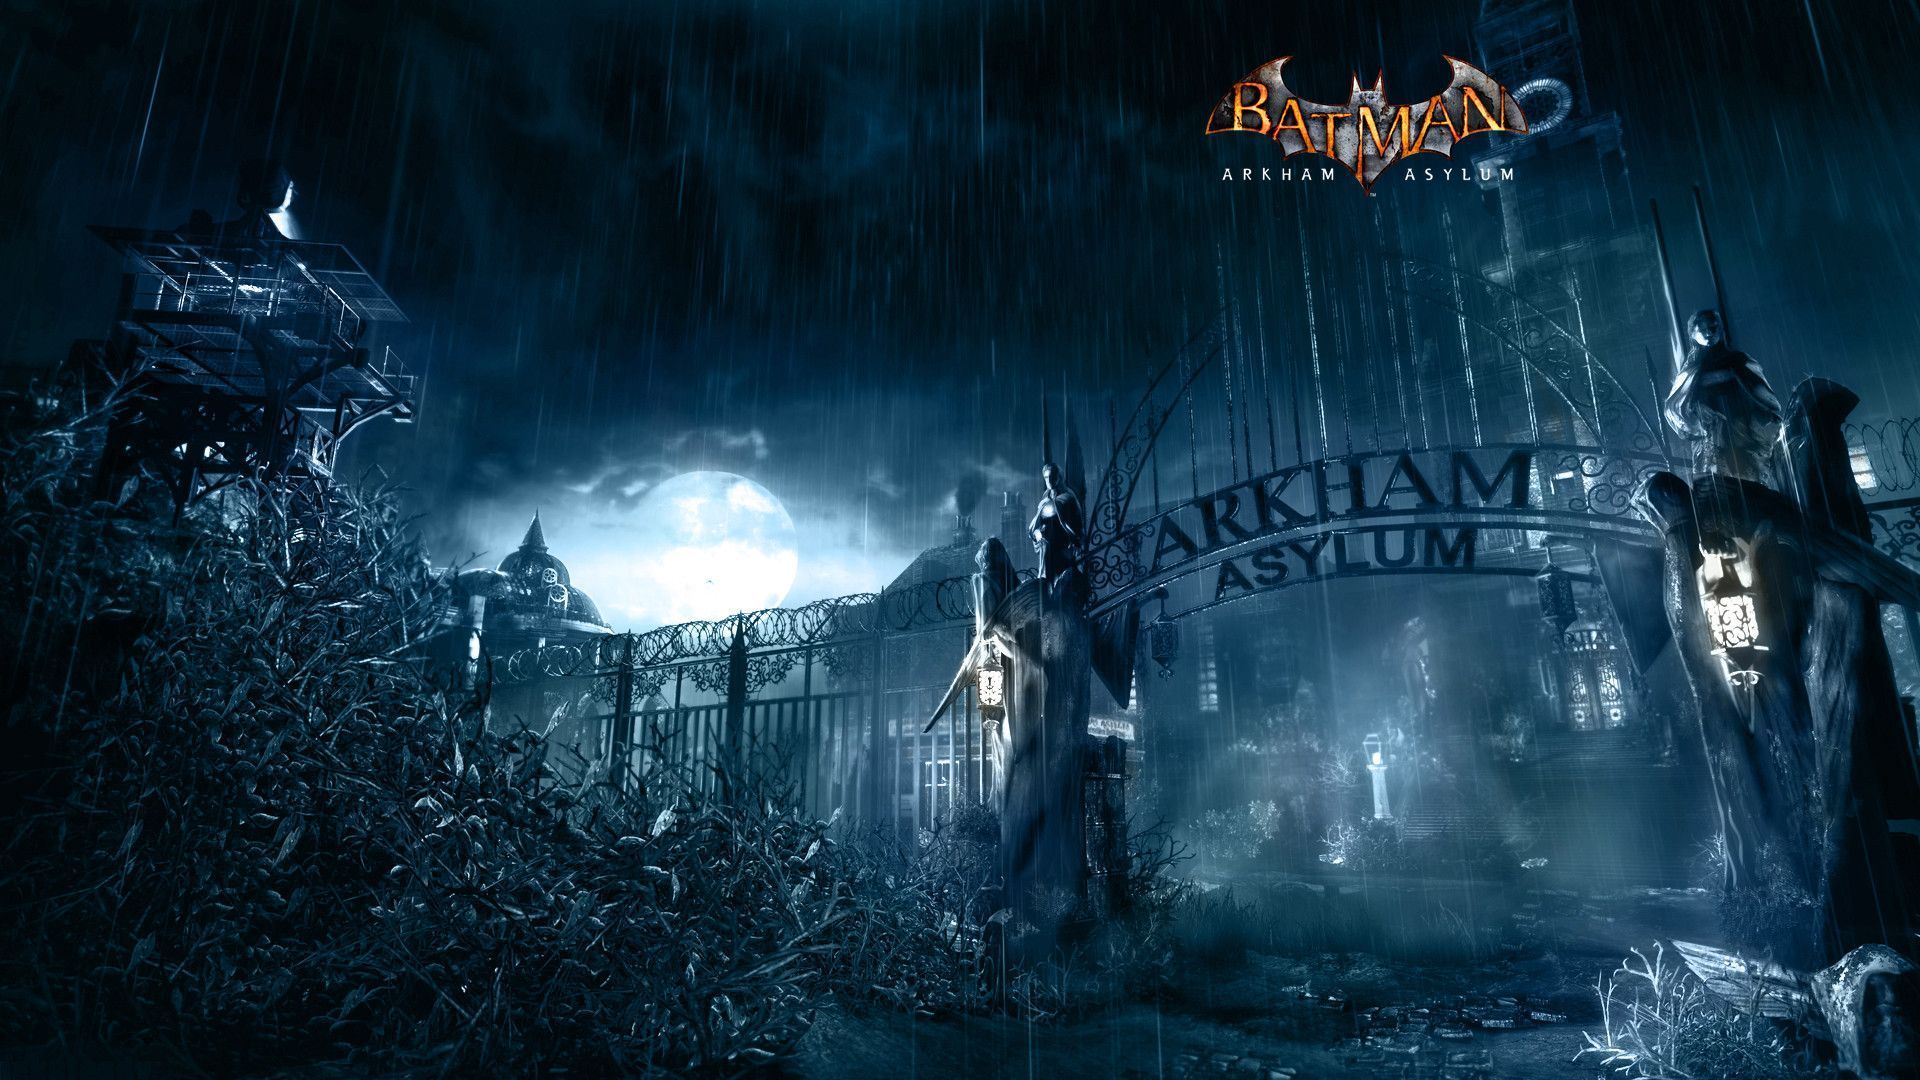 Batman Arkham Asylum HD Wallpapers and Background Images   stmednet 1920x1080